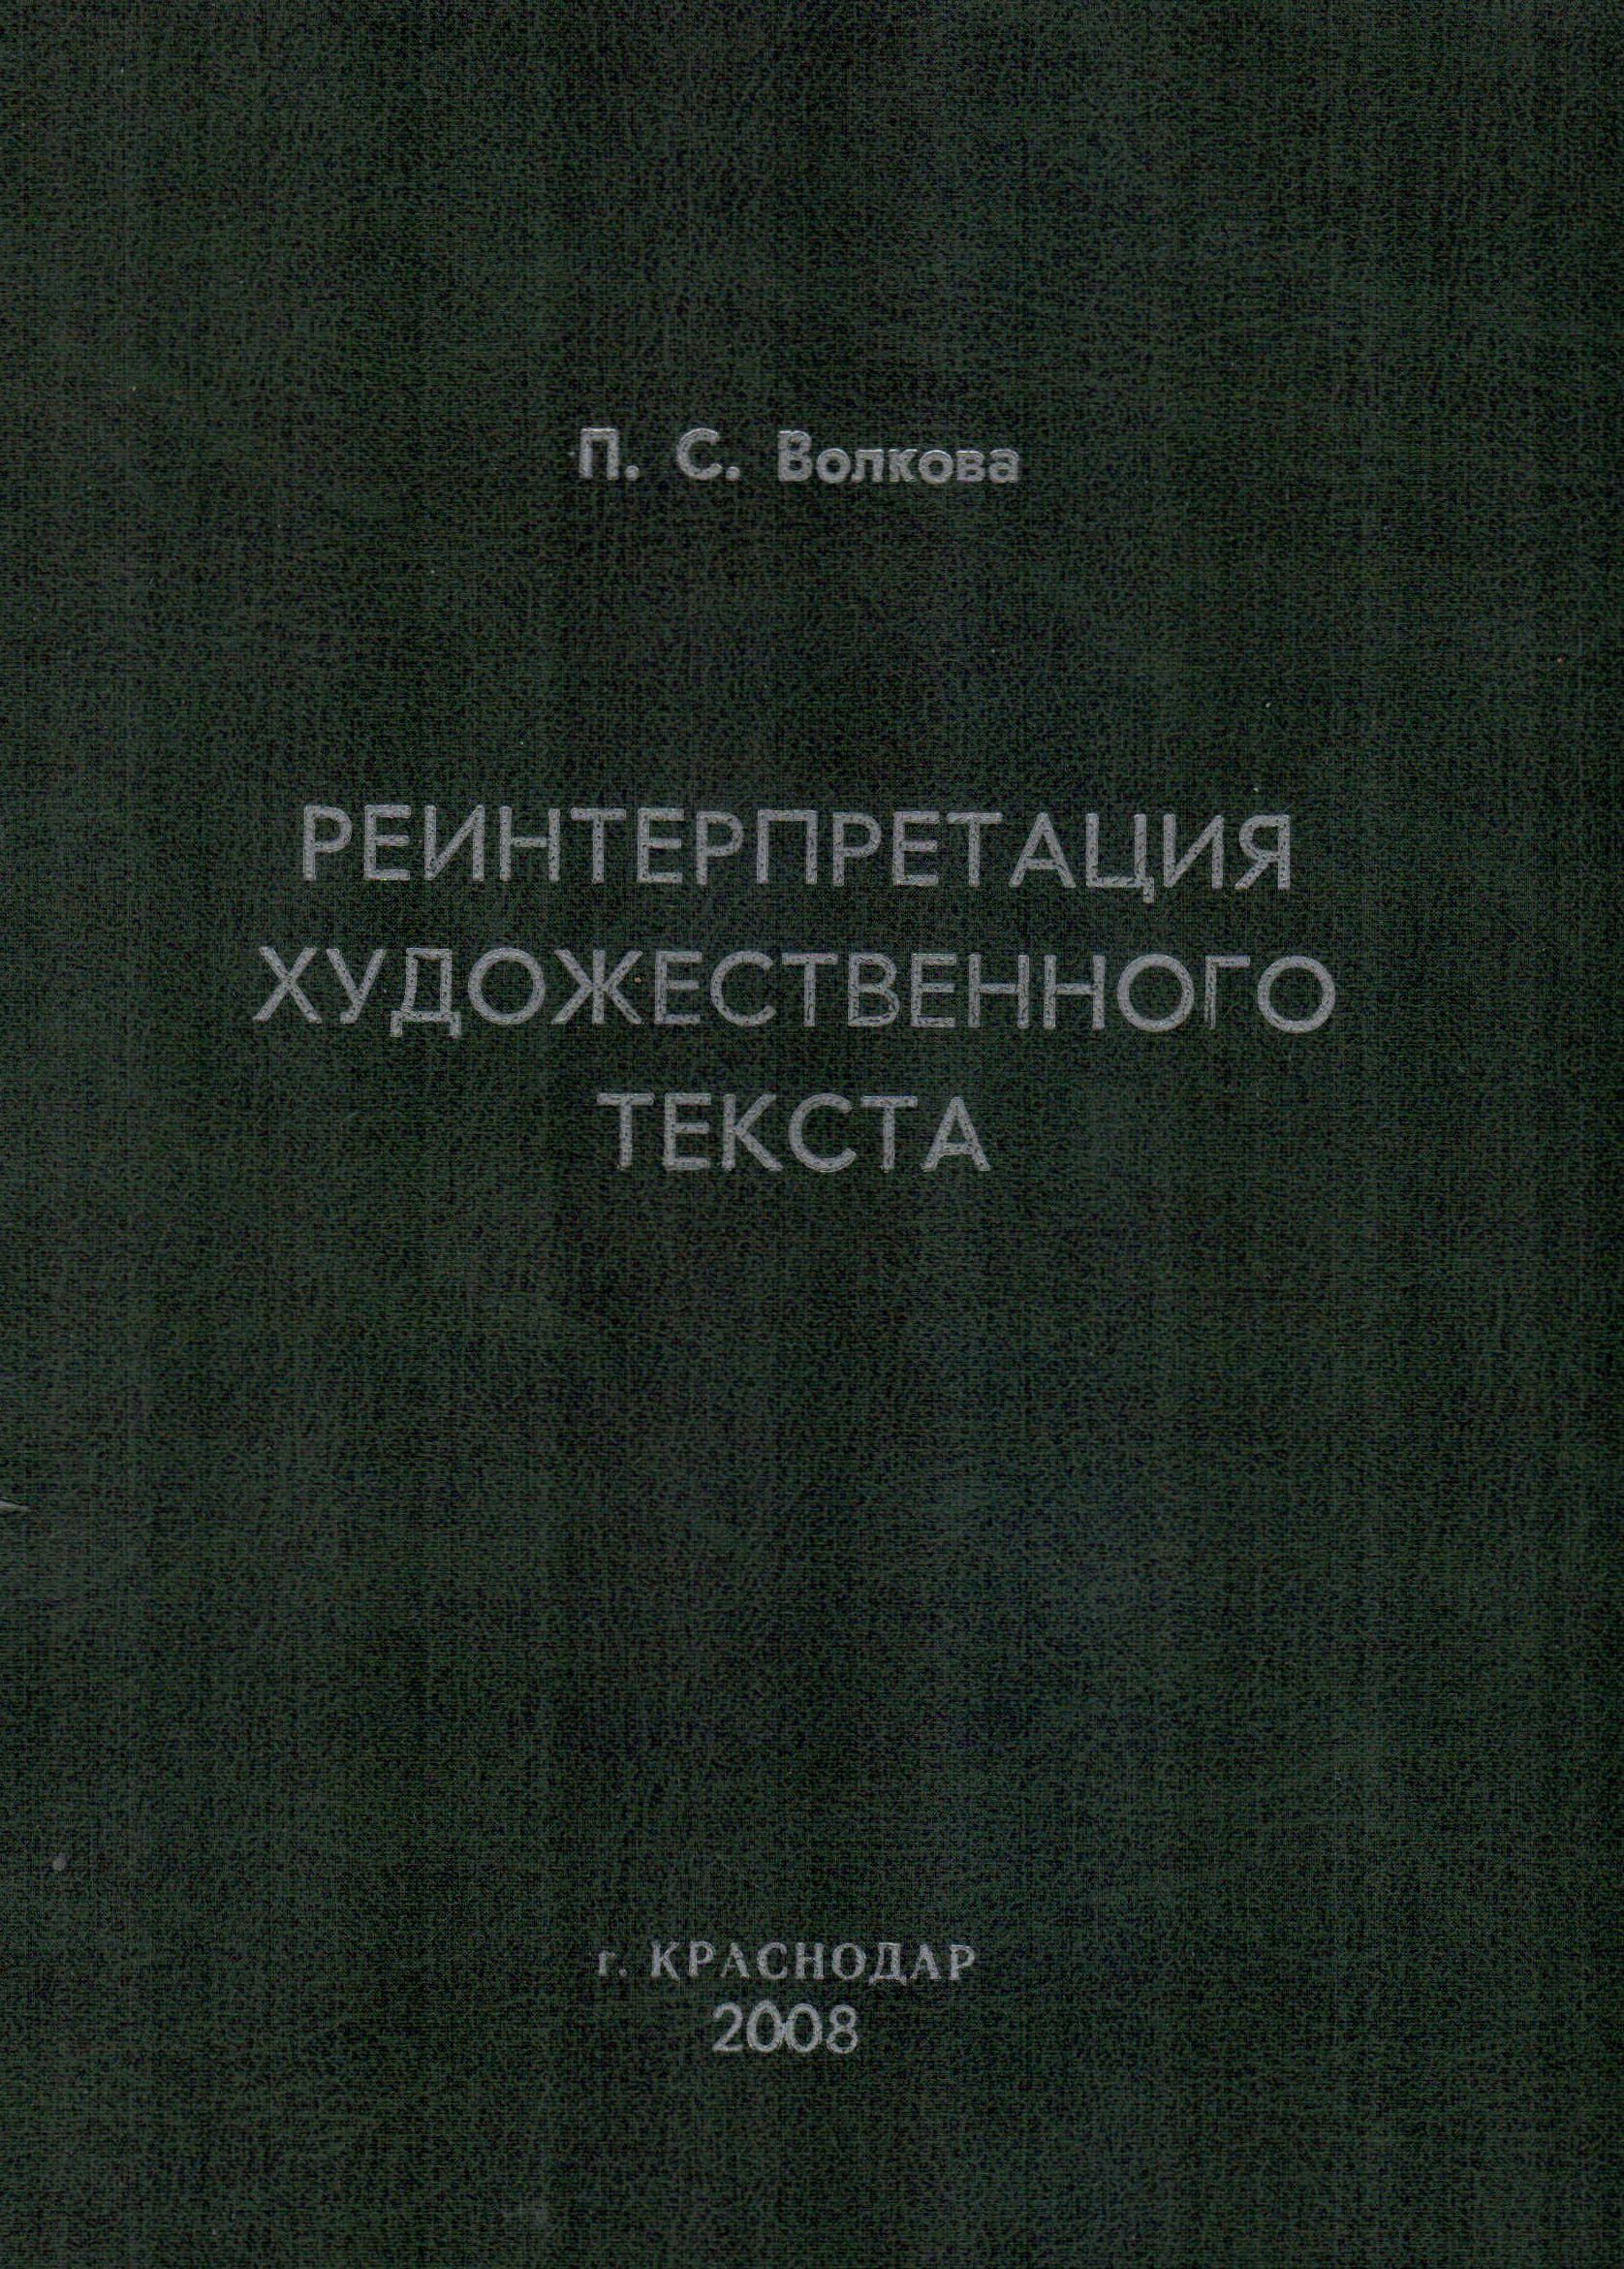 3 src=http://www.muzsoderjanie.ru/images/stories/reint.jpg